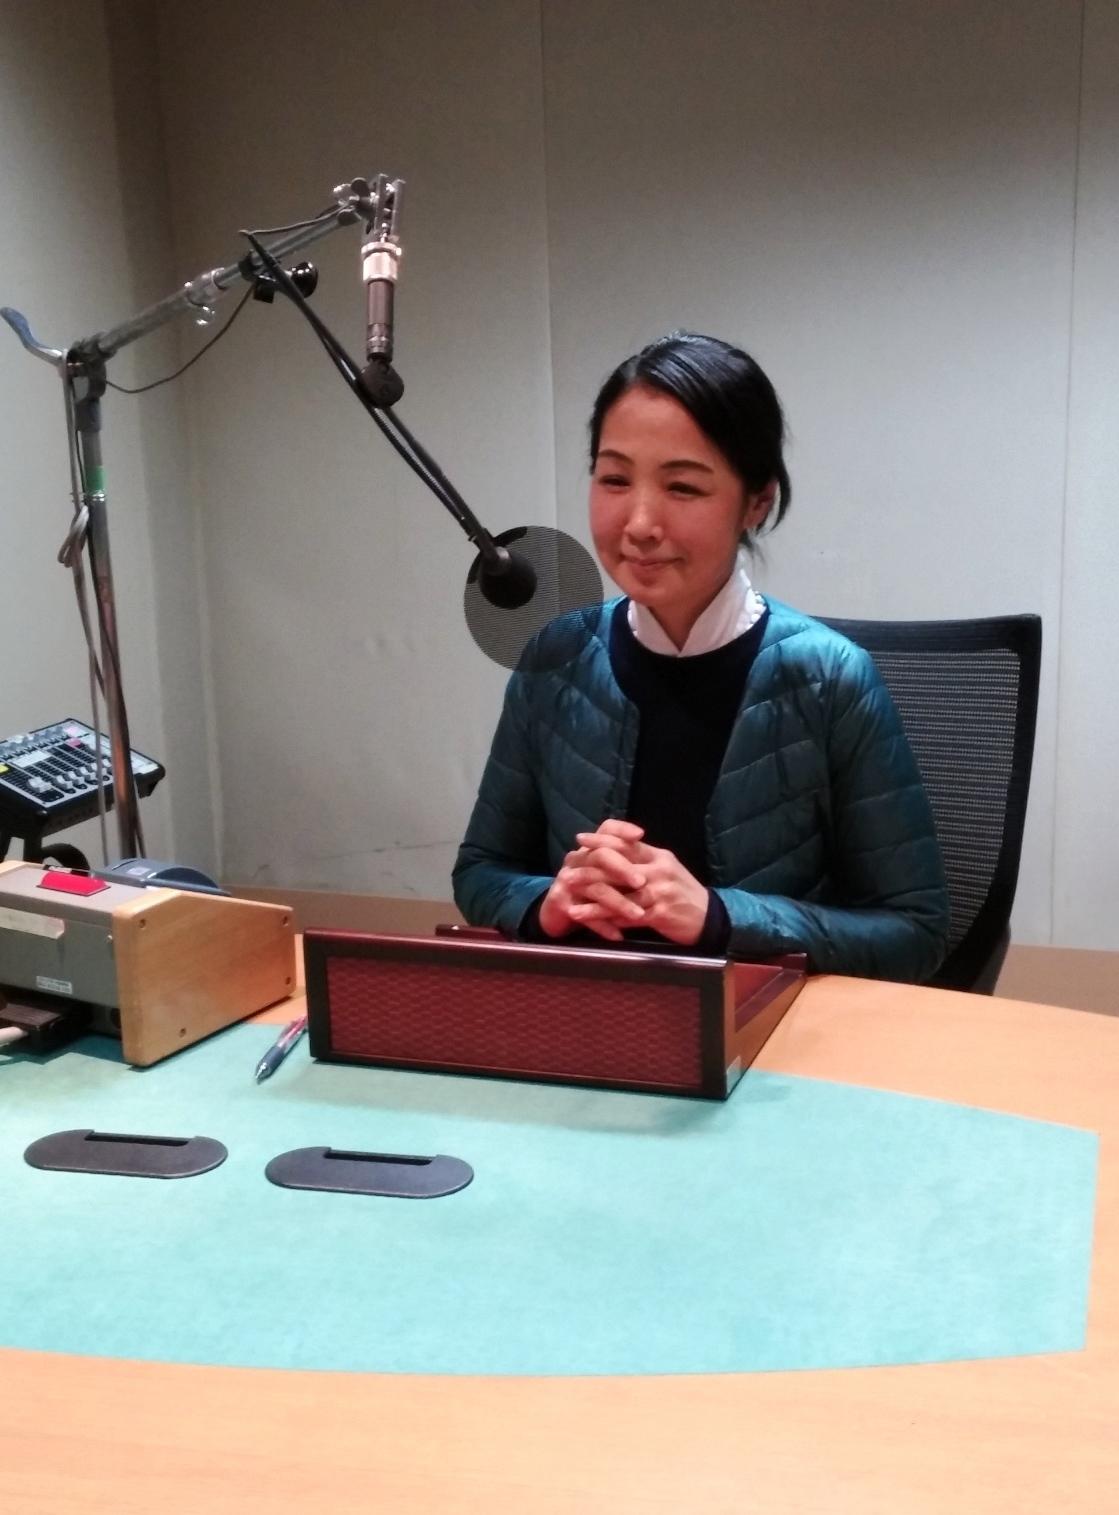 NHK『ラジオ深夜便』の収録でした_e0148373_13010098.jpg